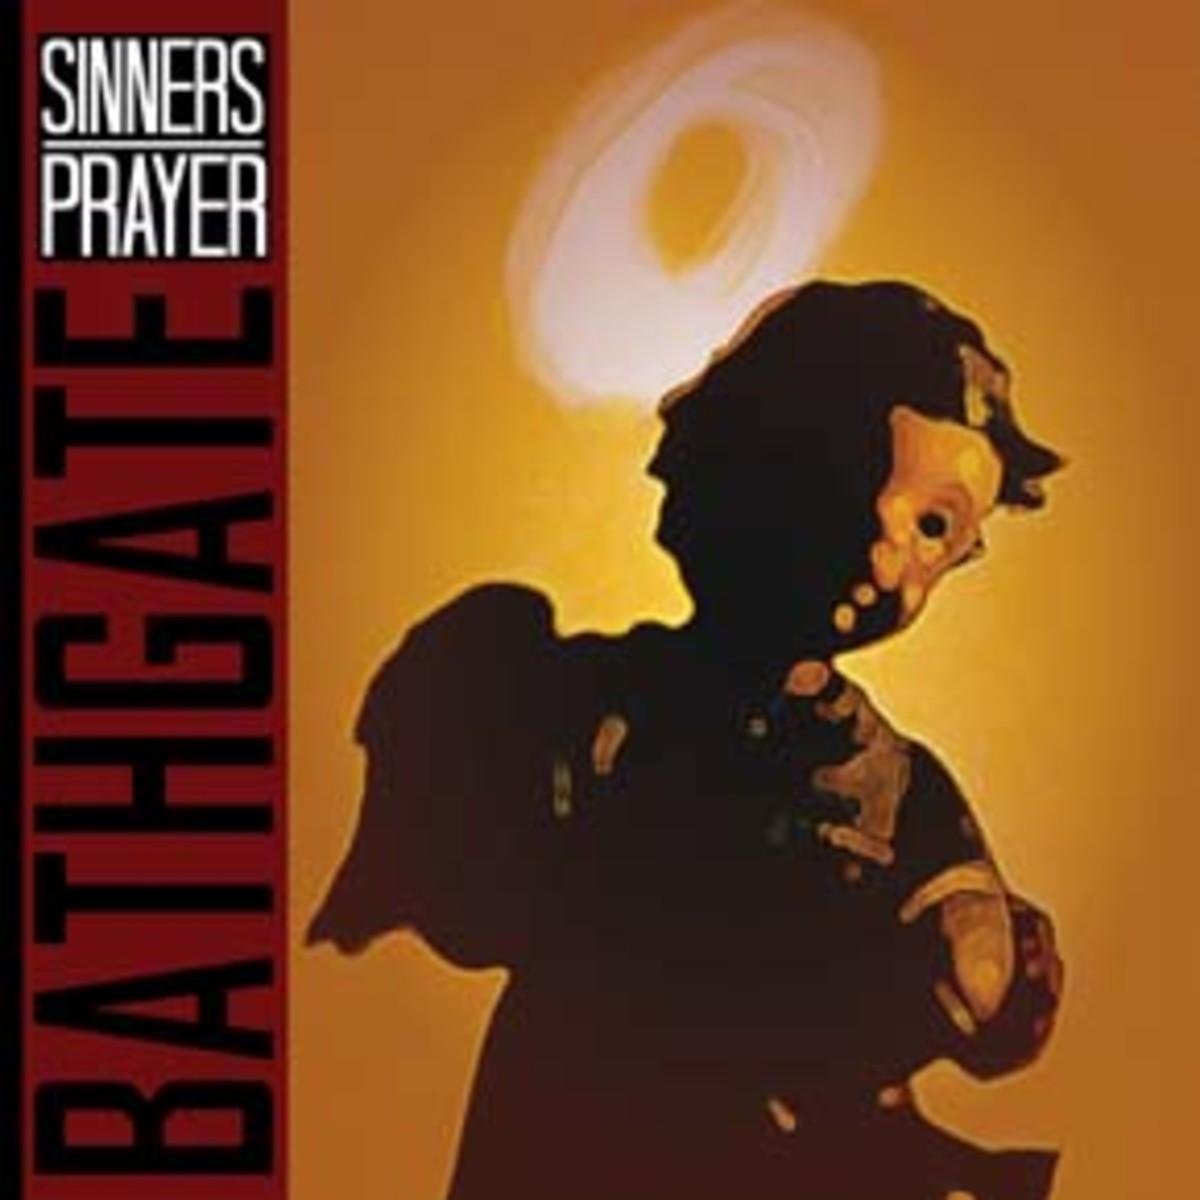 sinners-prayer-front.jpg